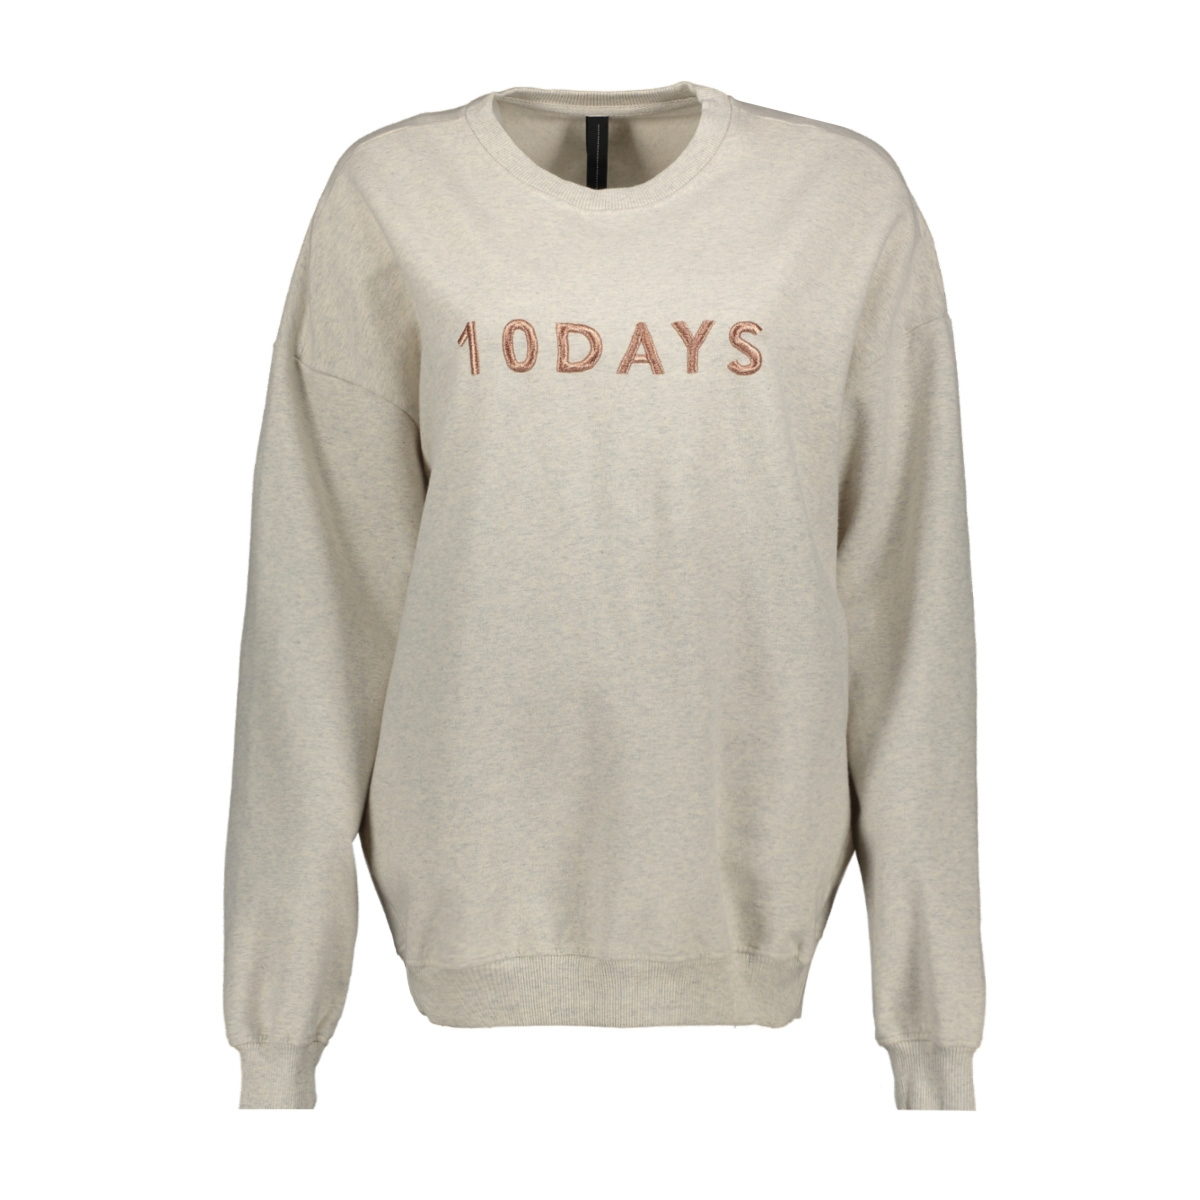 20 801 9101 10 days sweater soft white melee